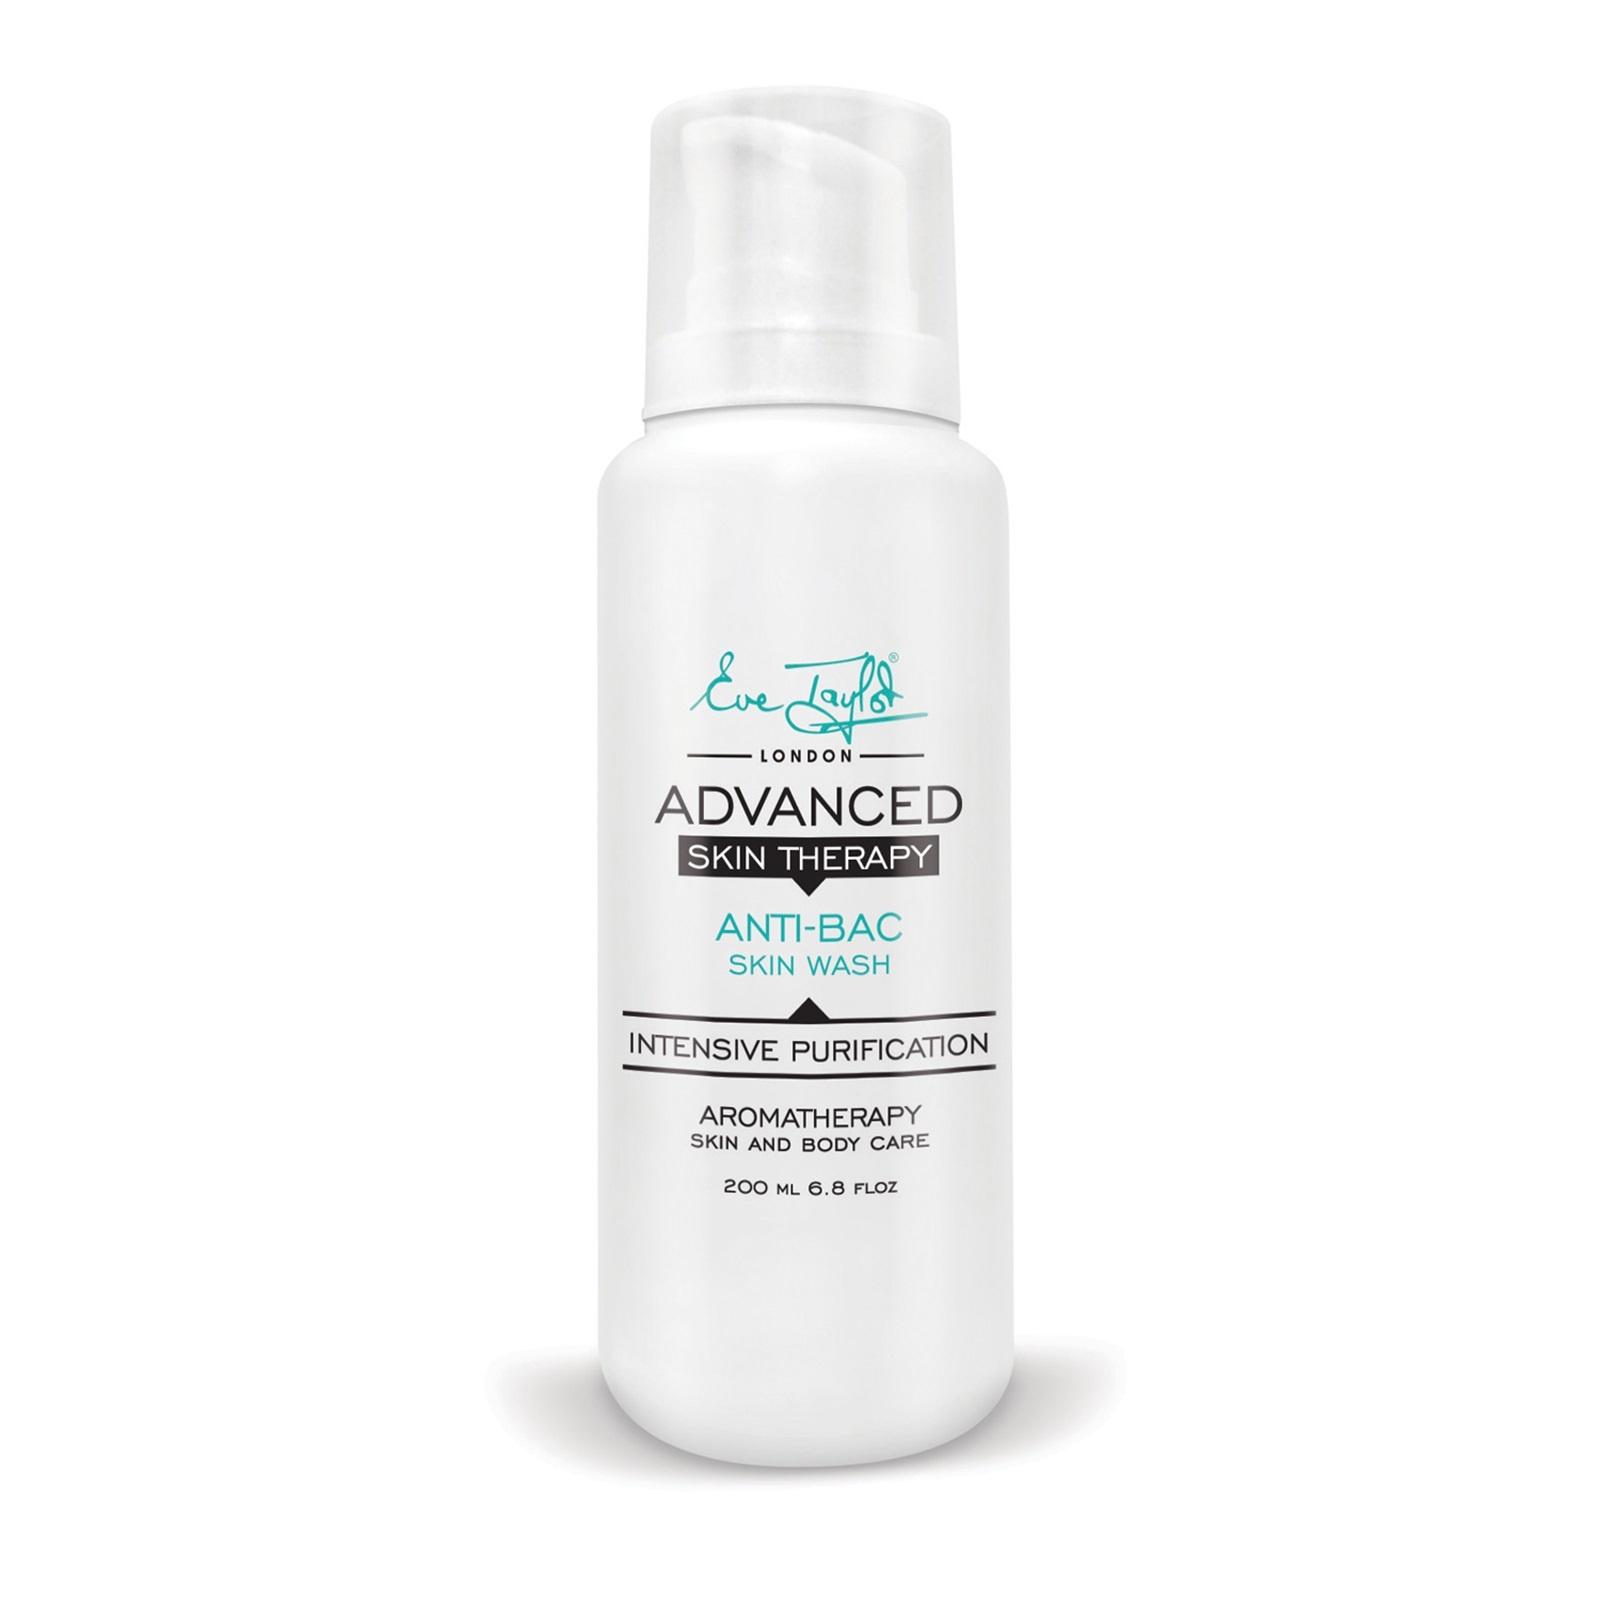 Eve Taylor Clarifying (Advanced Anti-Bac) Skin Wash 200ML - Eve Taylor